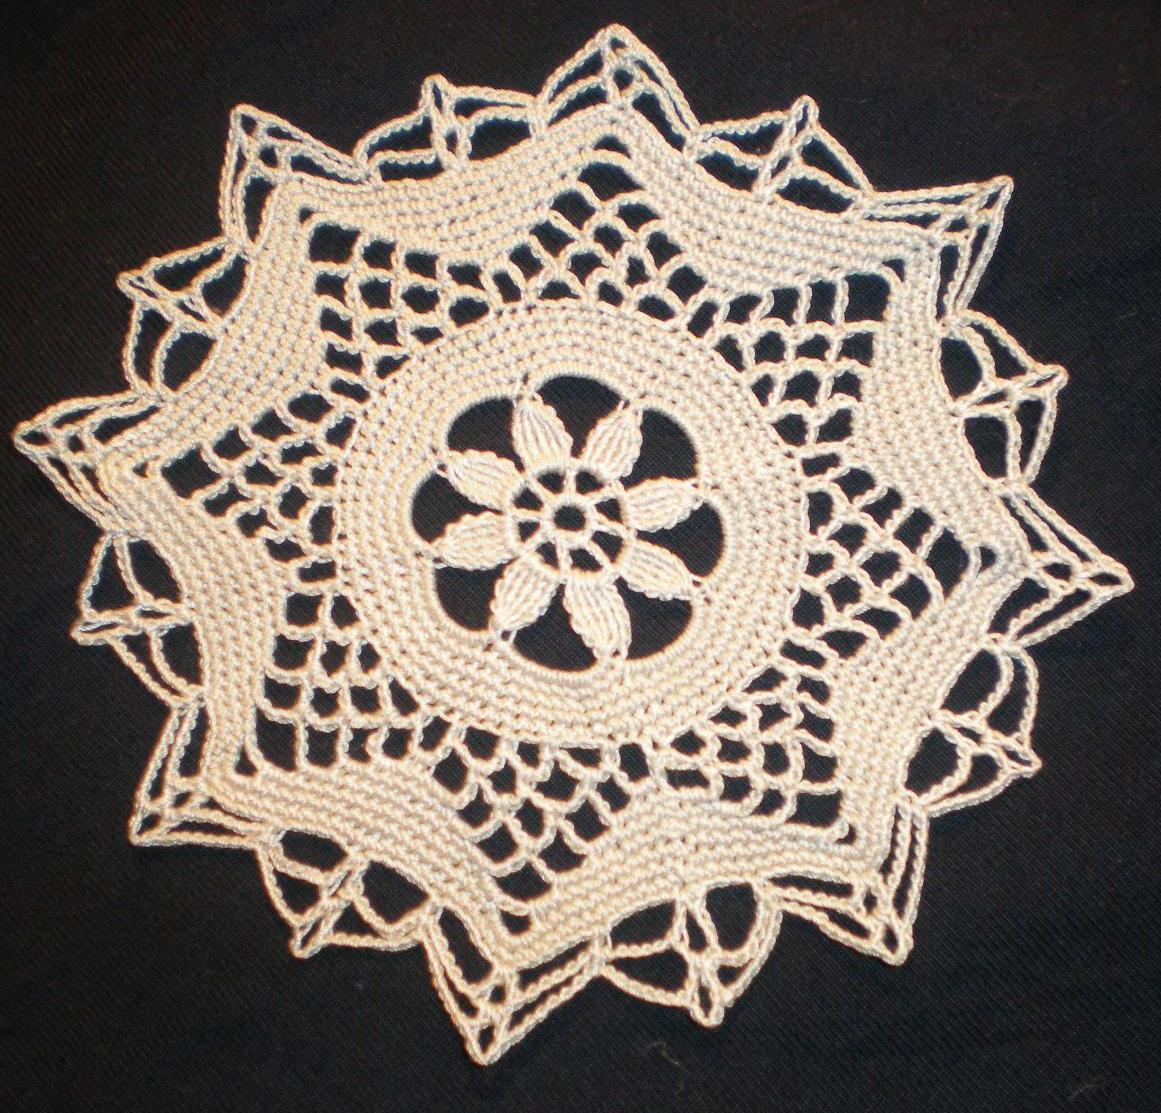 THREAD CROCHET TABLECLOTH PATTERNS – Easy Crochet Patterns